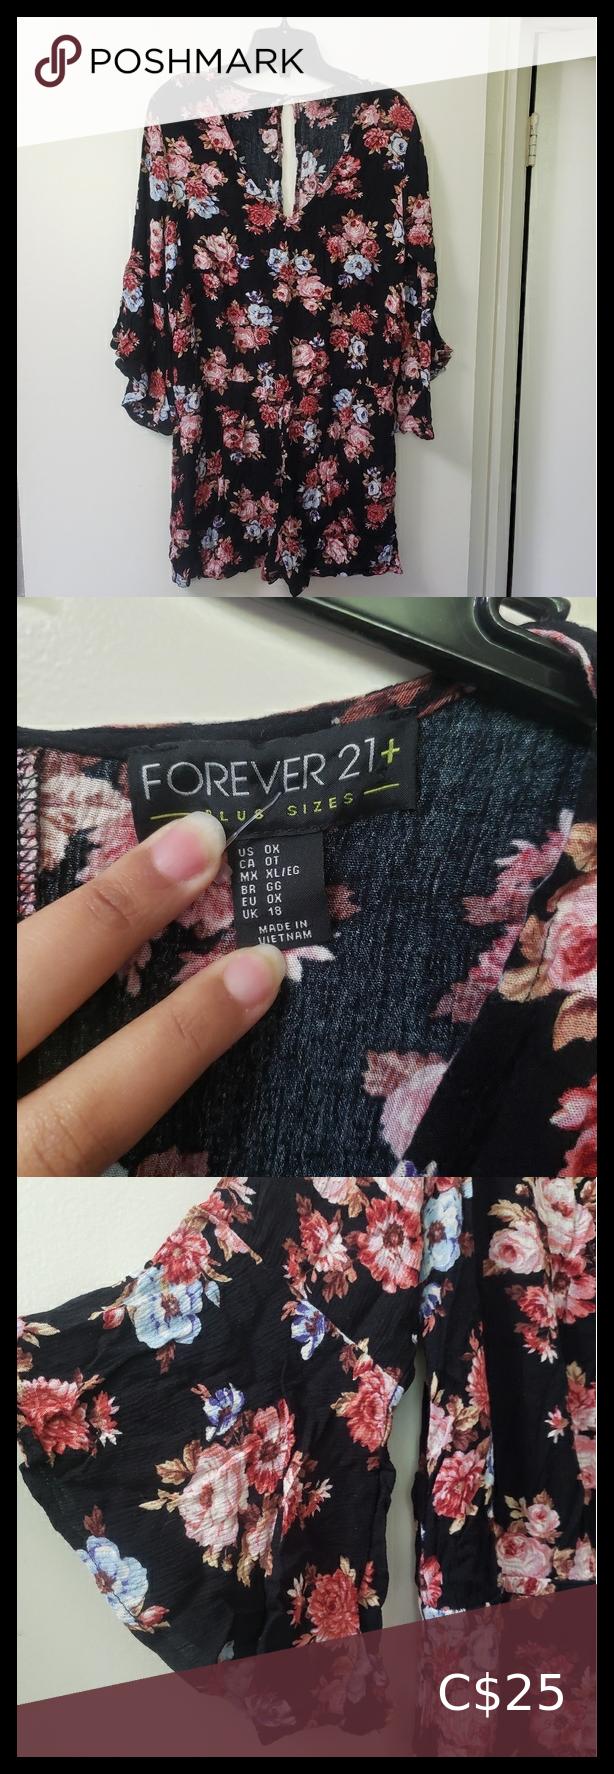 Floral romper!!! Floral romper!!! BNWT floral romper. Outfit: resort, beach, girls night !!! Forever 21